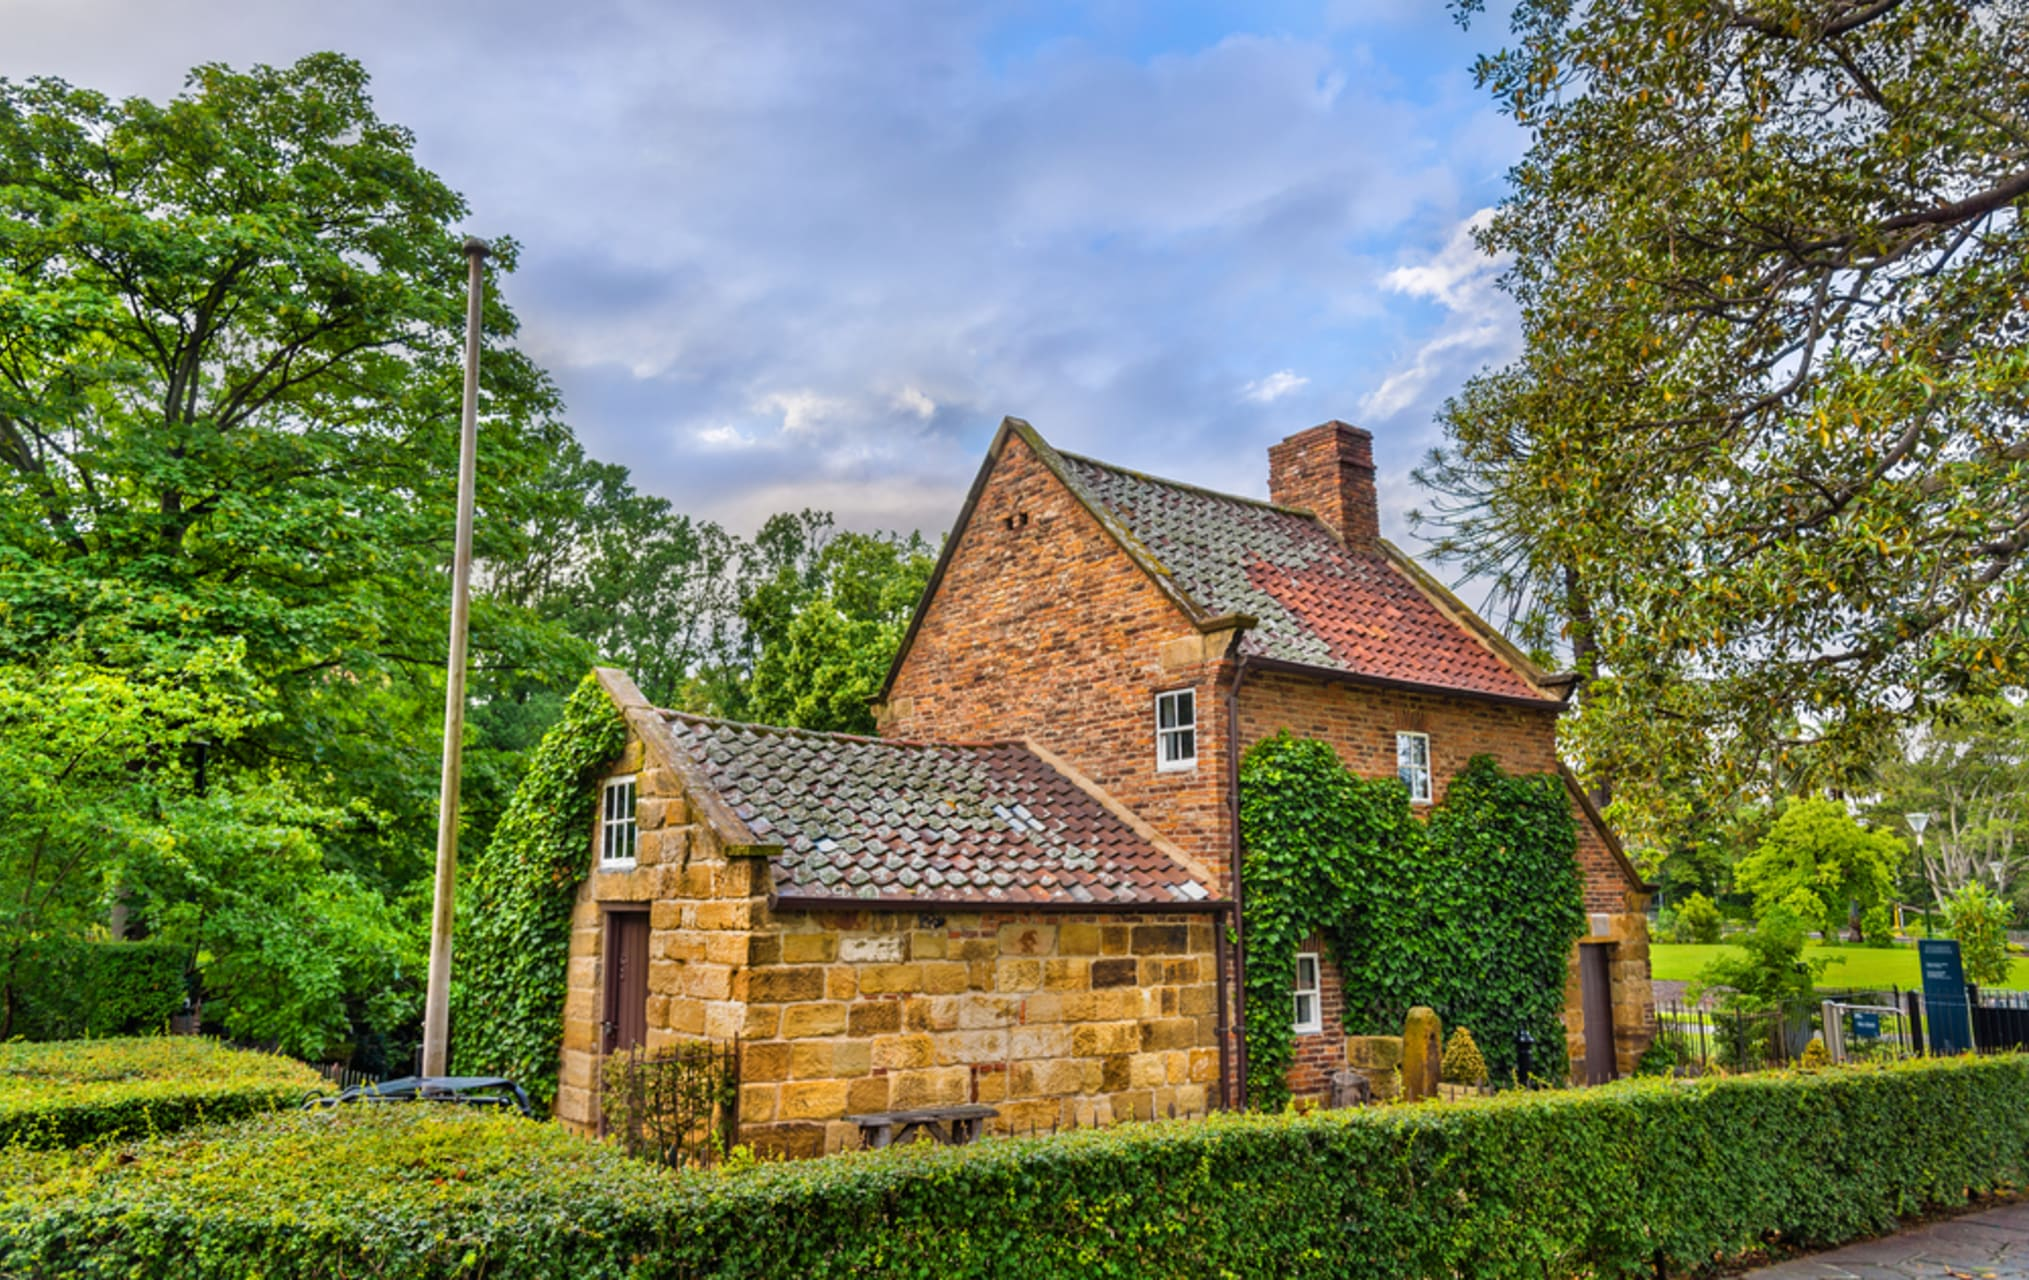 Melbourne - Cook's Cottage and Tudor Miniature Village